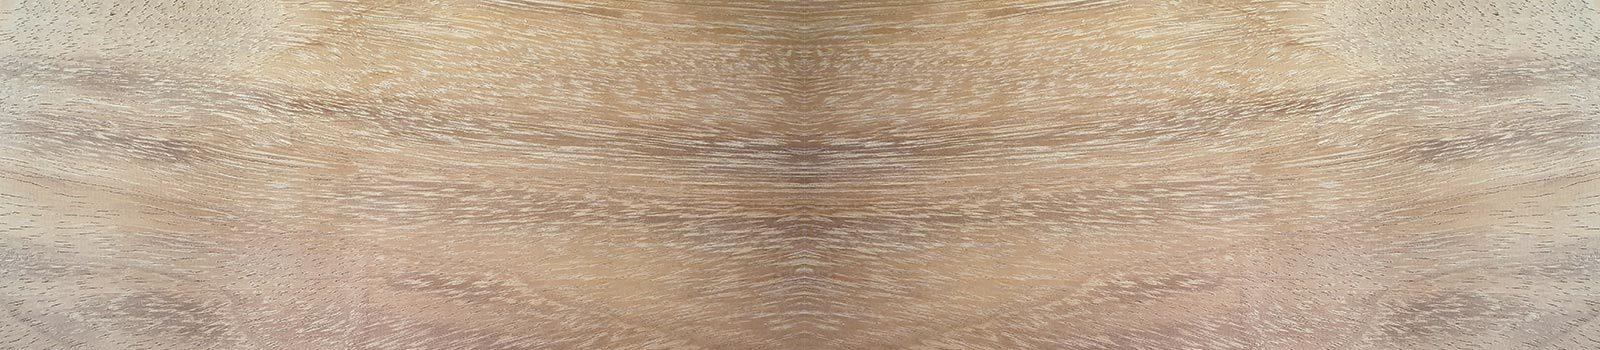 Iroko hardwood timber